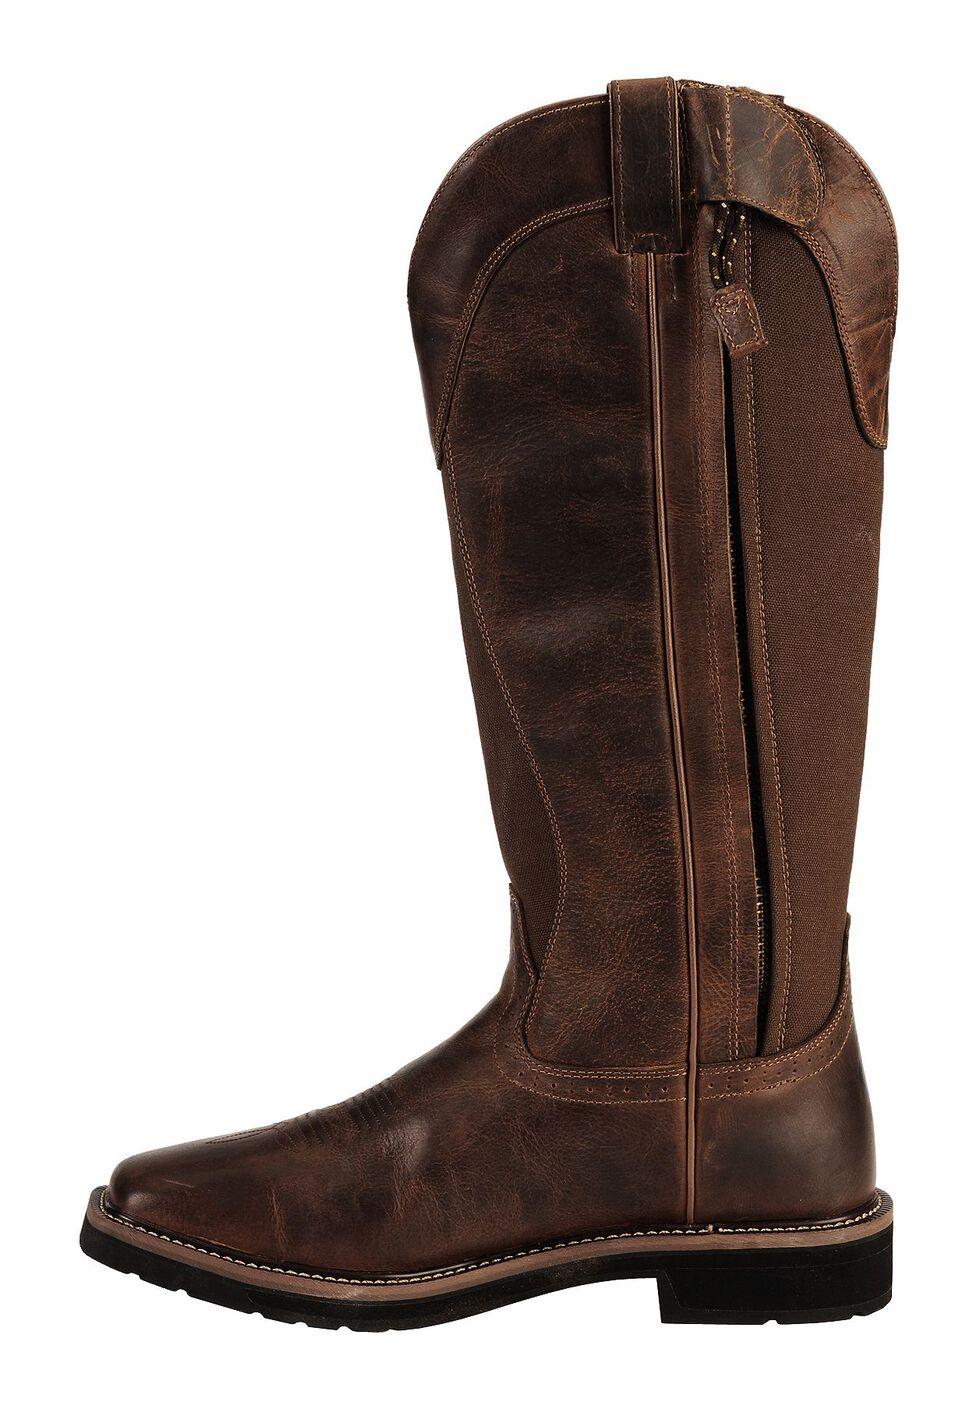 "Justin Men's 17"" Fielder Brown Snake Proof Boots - Soft Toe, Tan, hi-res"